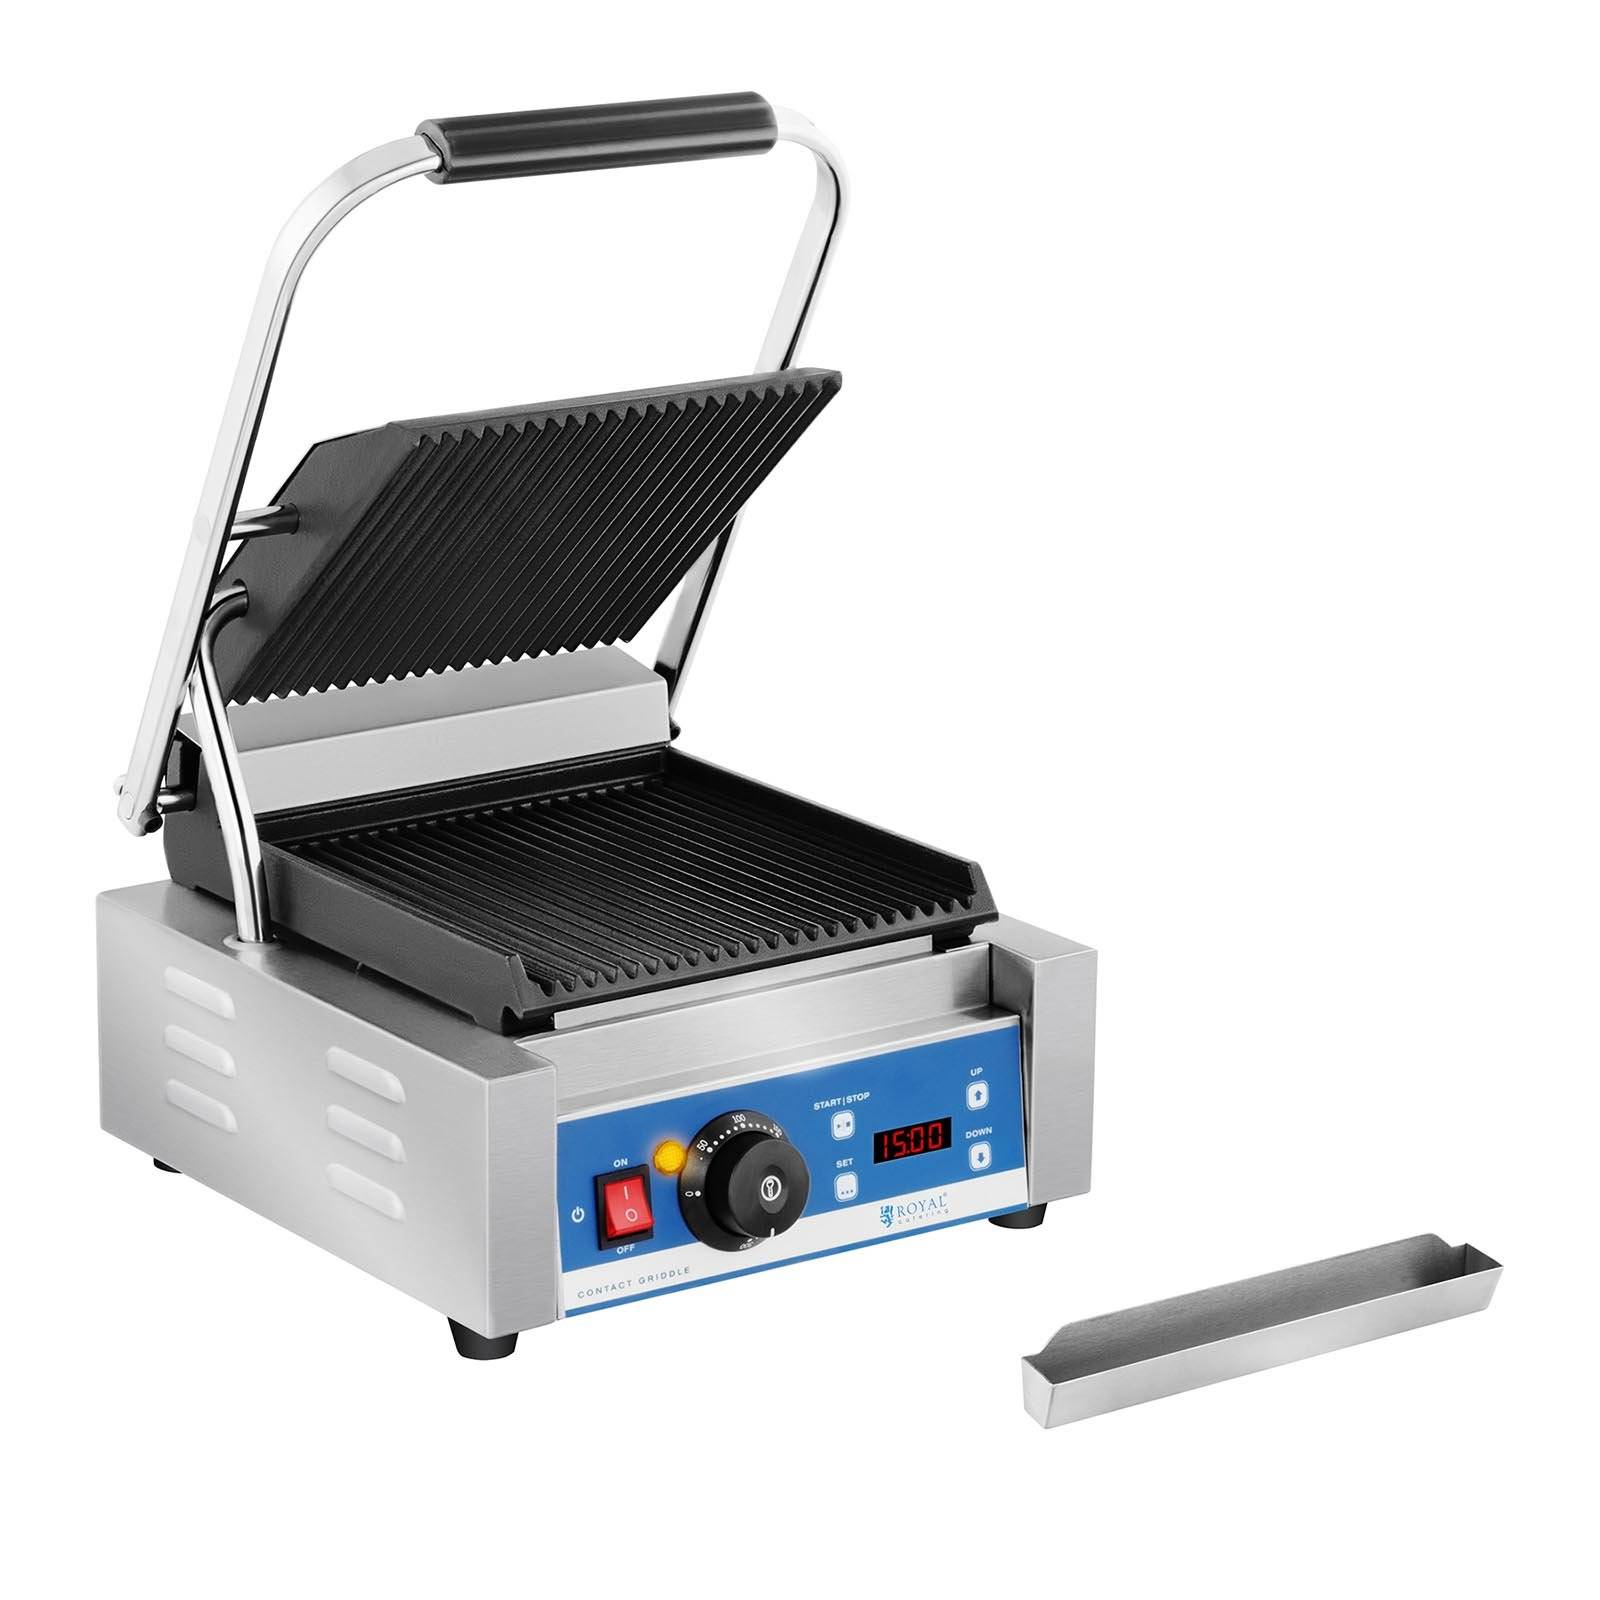 Royal Catering Piastra per panini - rigata - timer - 1.800 W RCKG-2200-GY